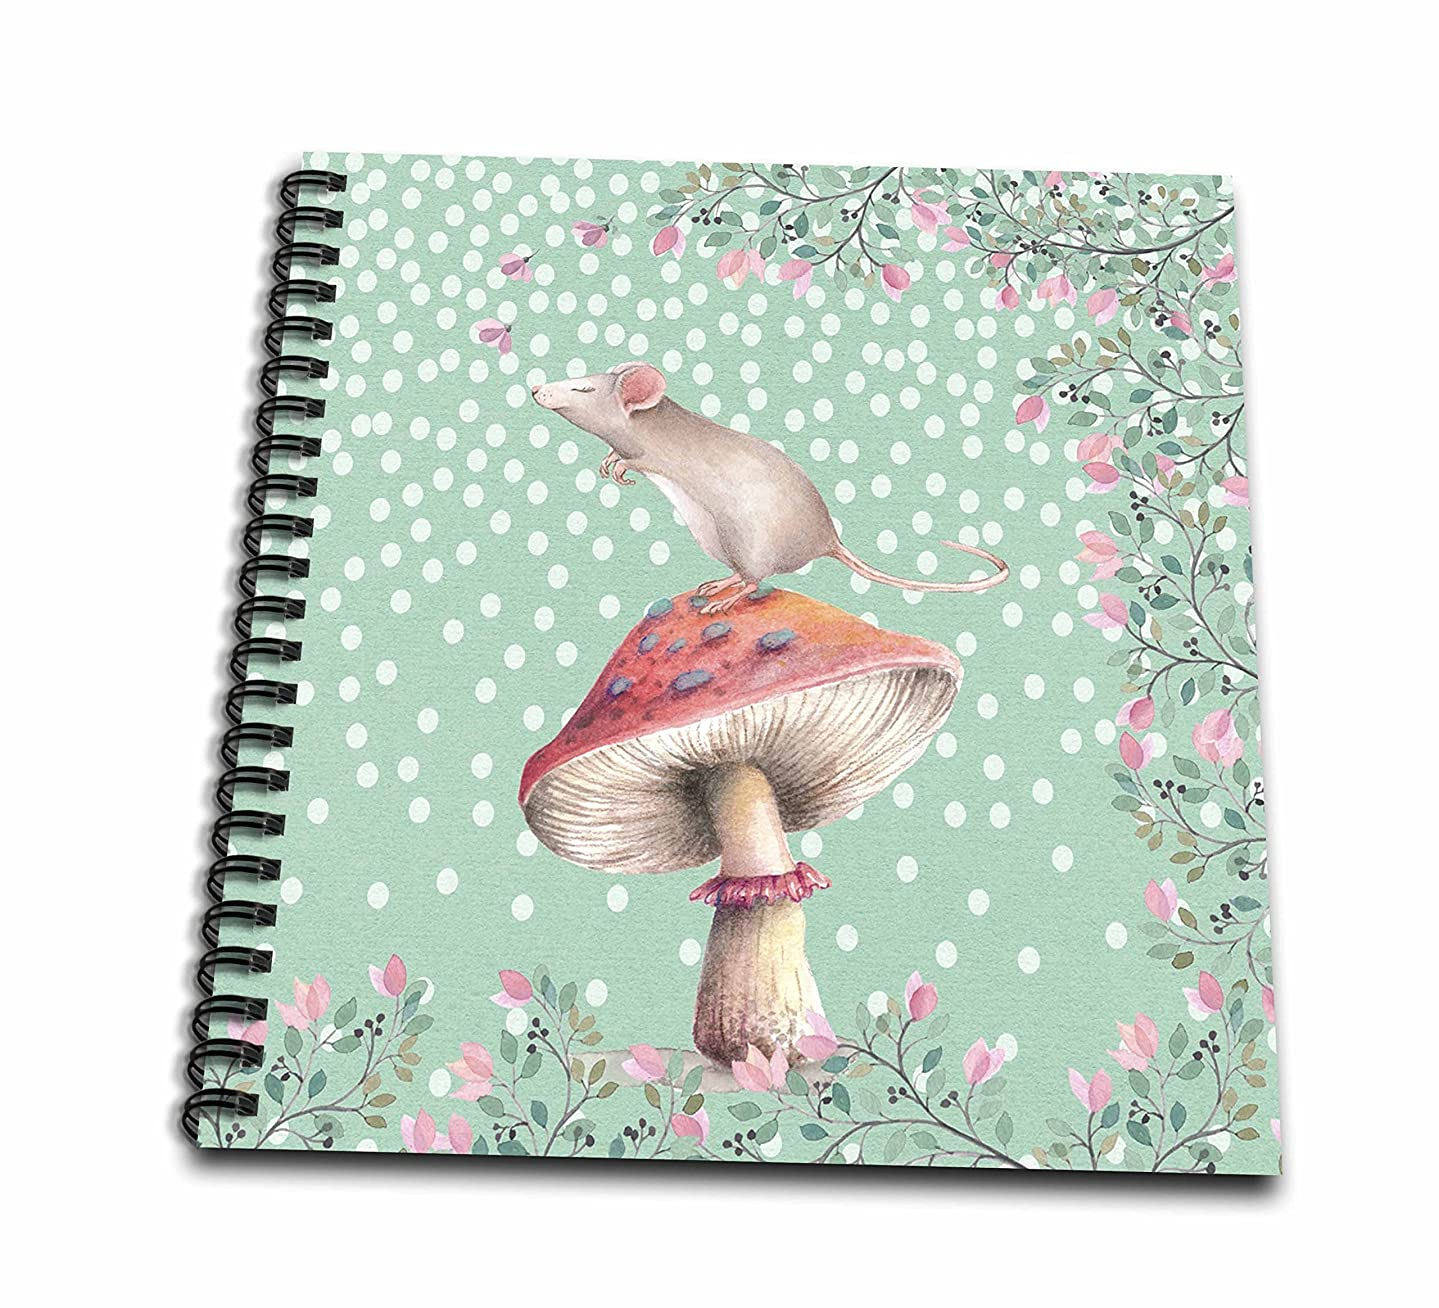 3D Rose Mouse Animal Floral Flowers Mushroom dots Illustration Drawing Book